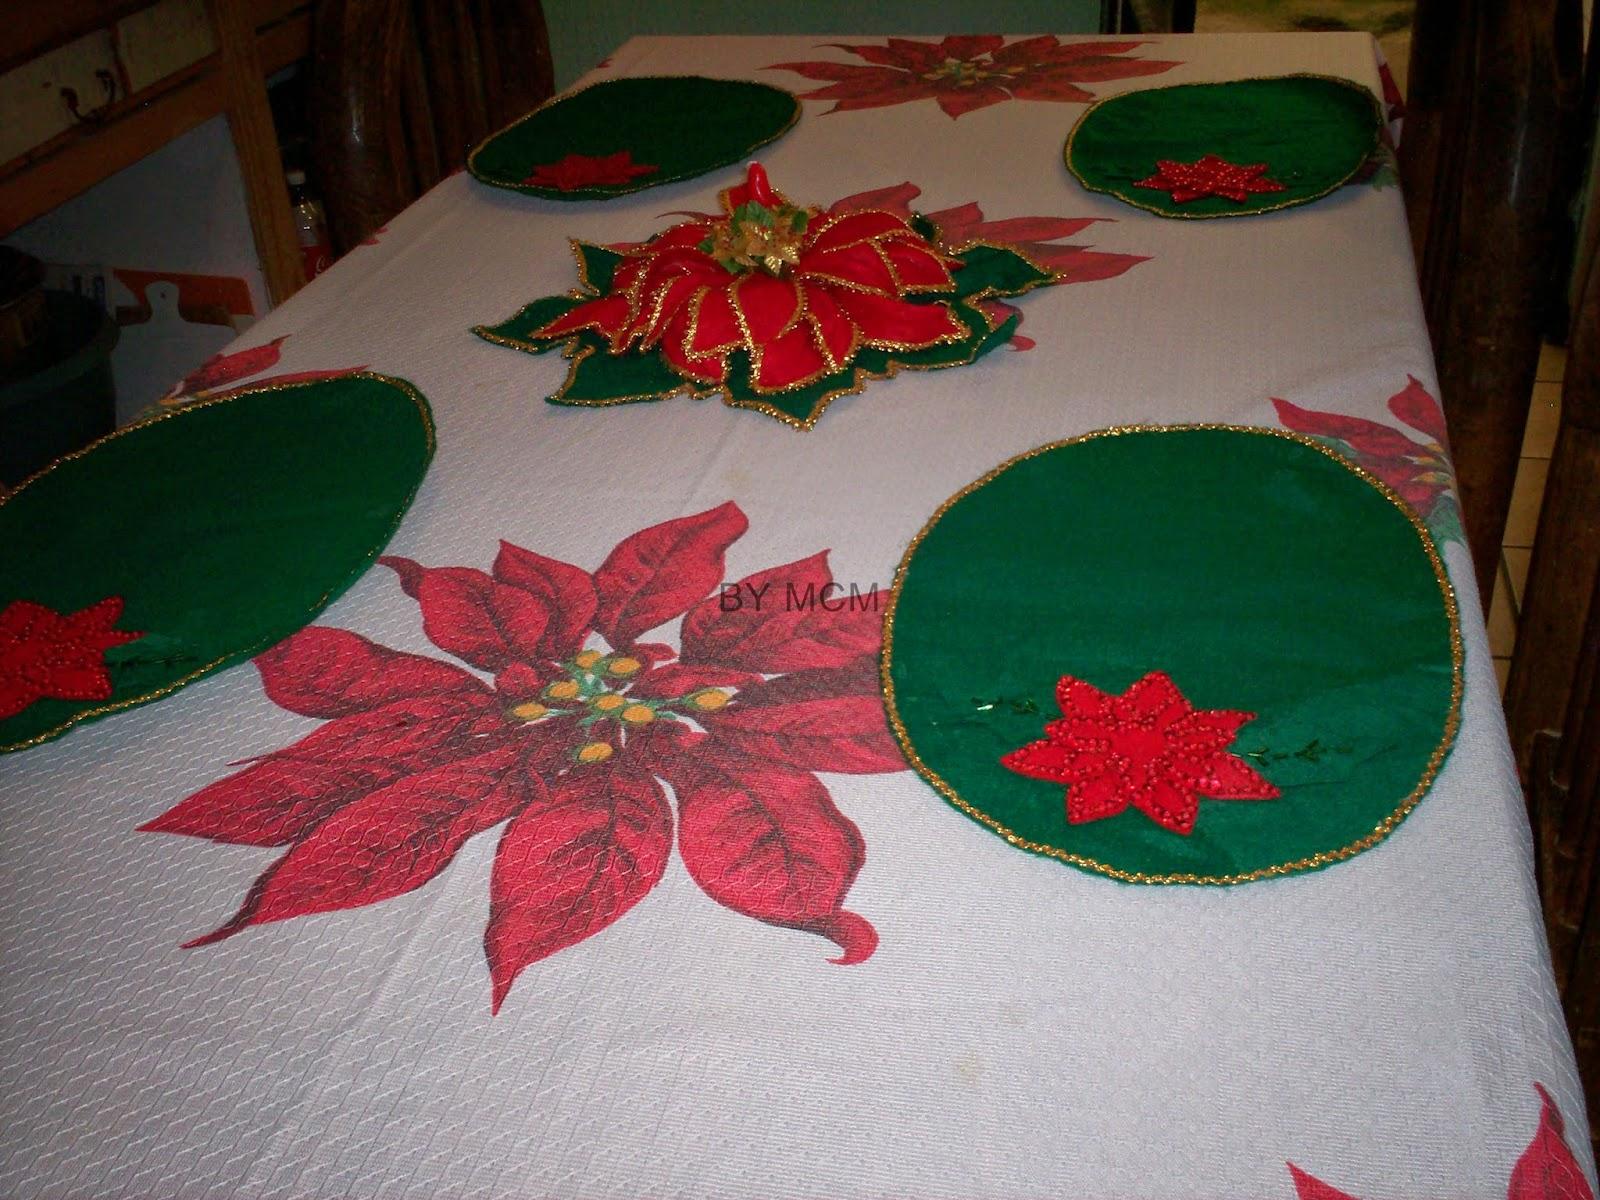 Hacer manteles individuales aprender manualidades es - Manteles navidenos ...